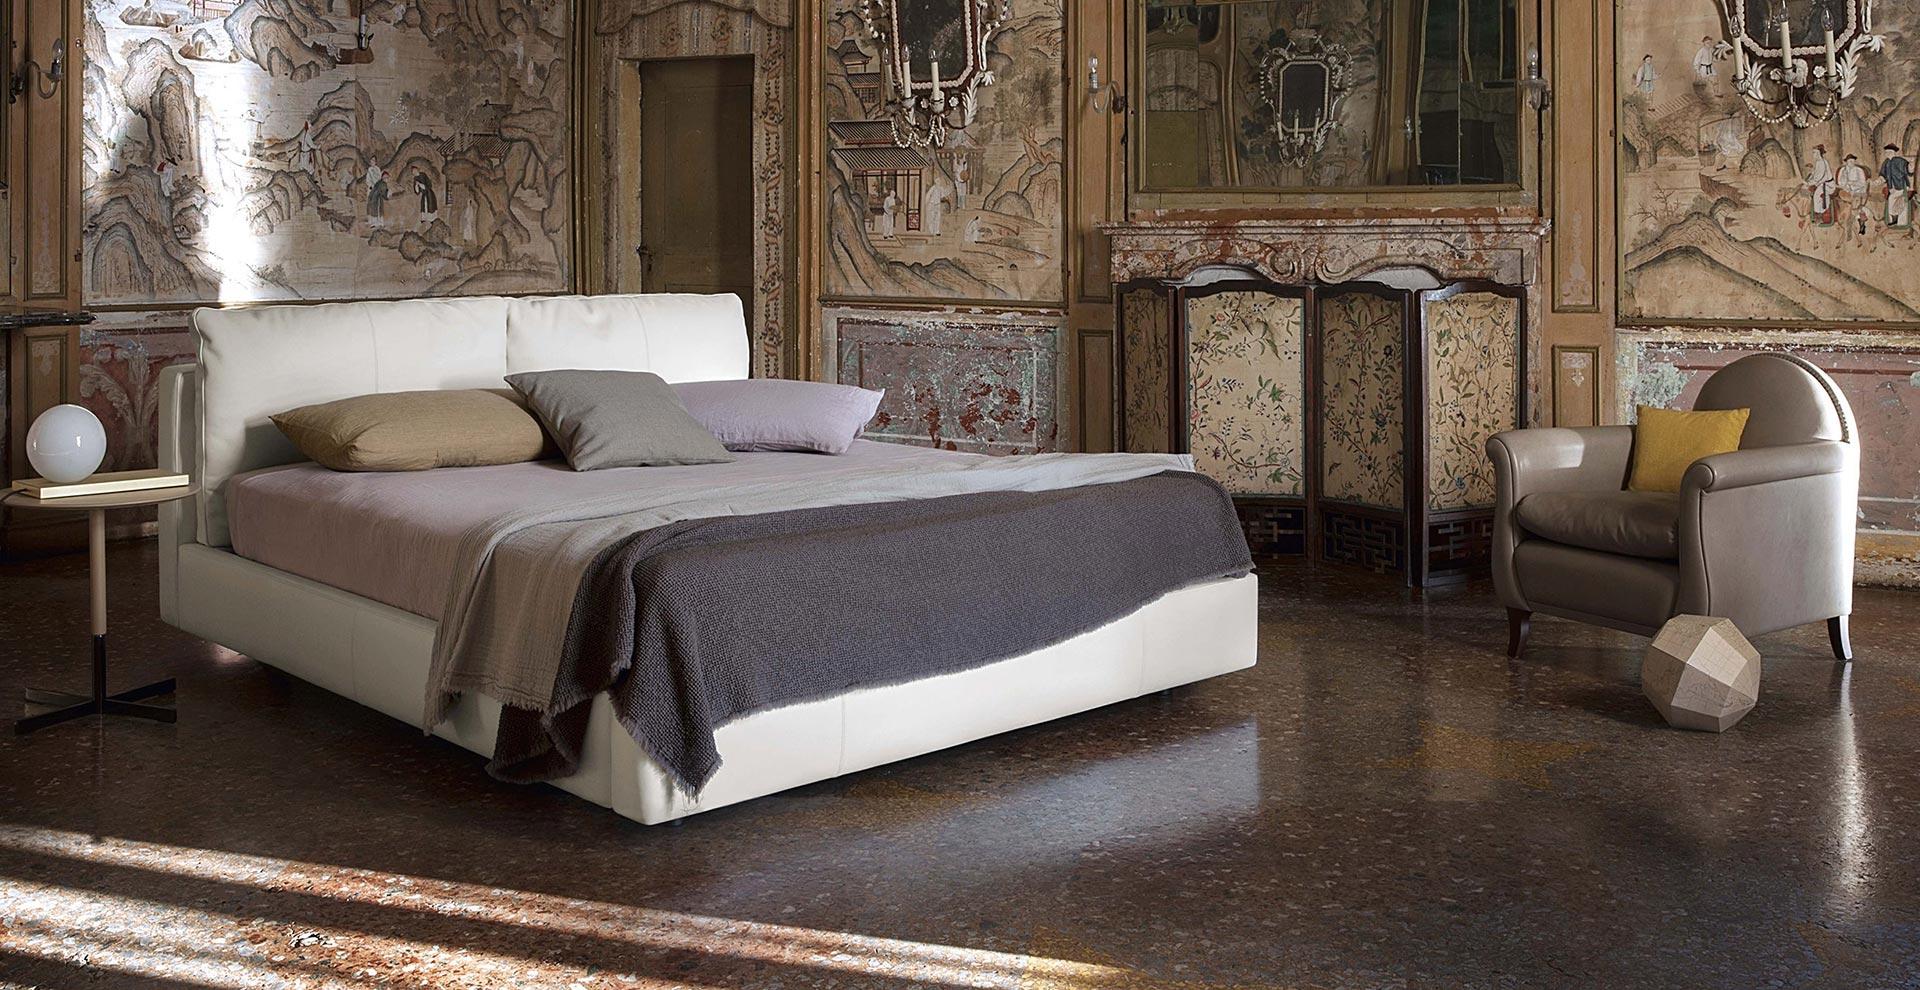 Massimosistema bed poltrona frau bett massimosistema bed for Sedie baxter usate